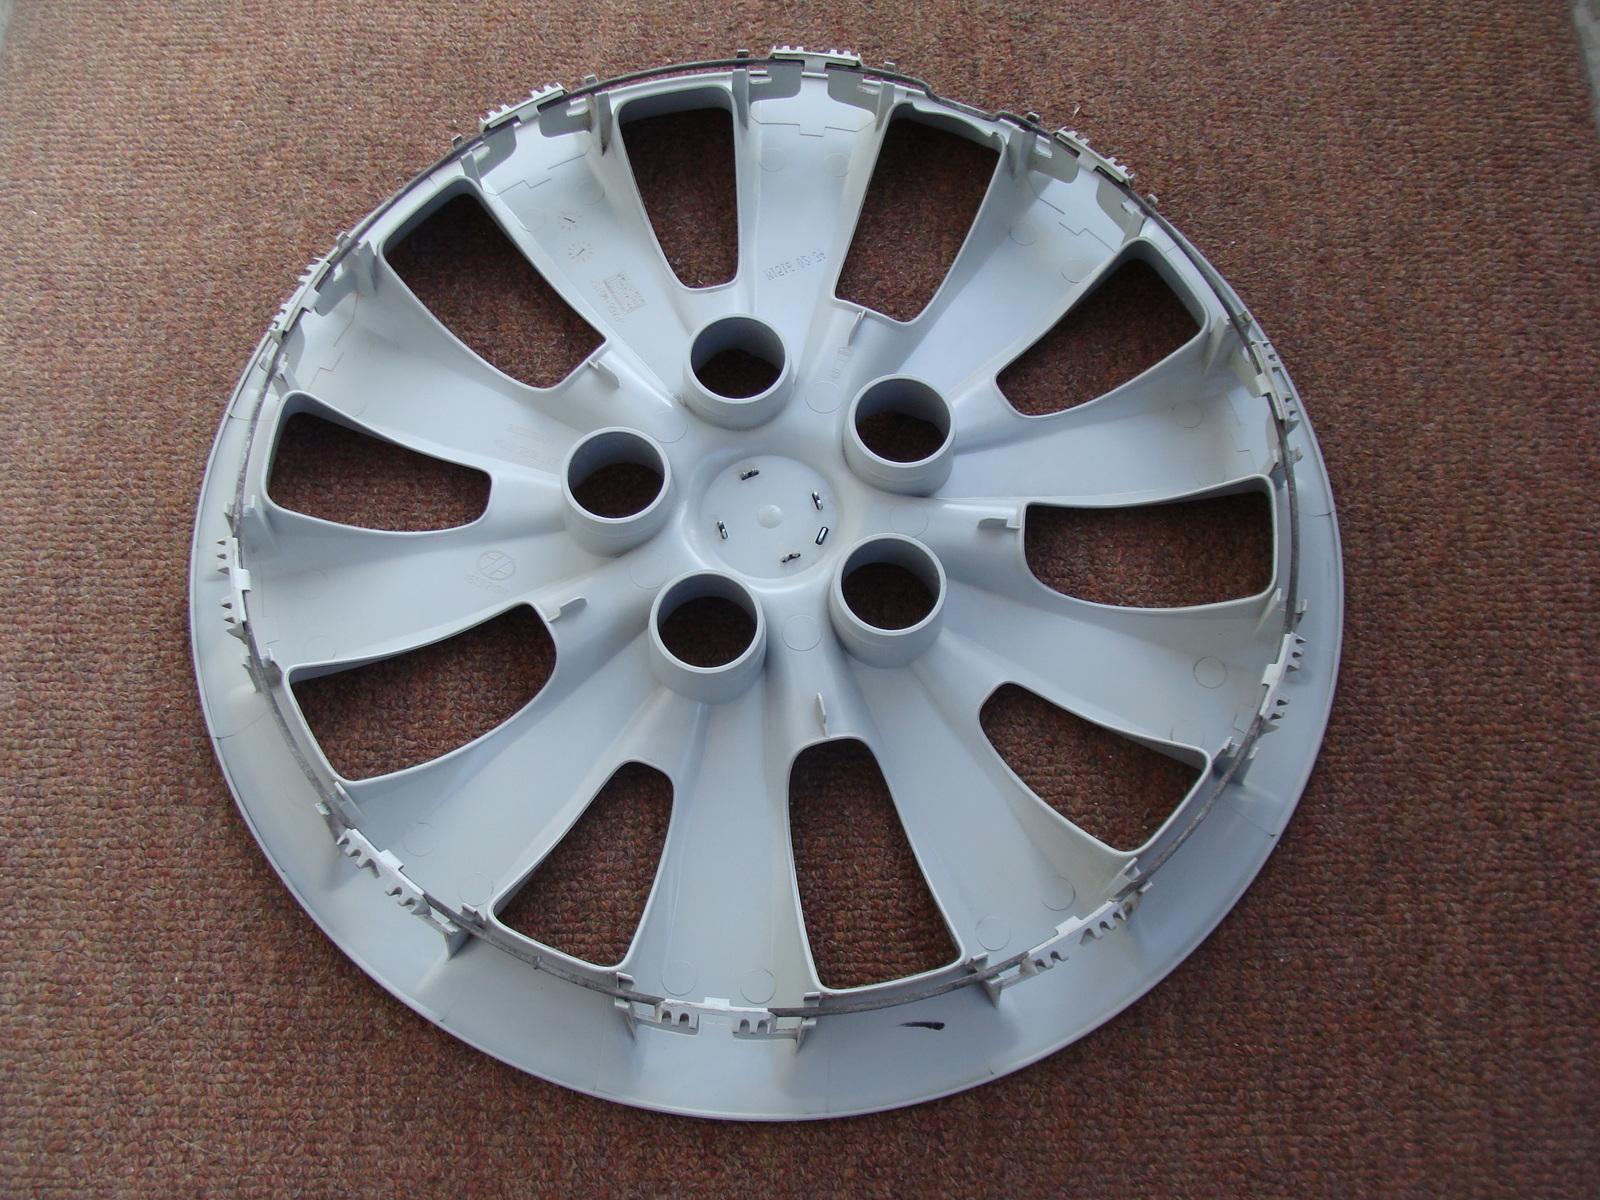 PSI KPA Bar Kg//cm² All-In-1 MAXTUF Car Digital Tire Pressure Gauge W// Air Chunk